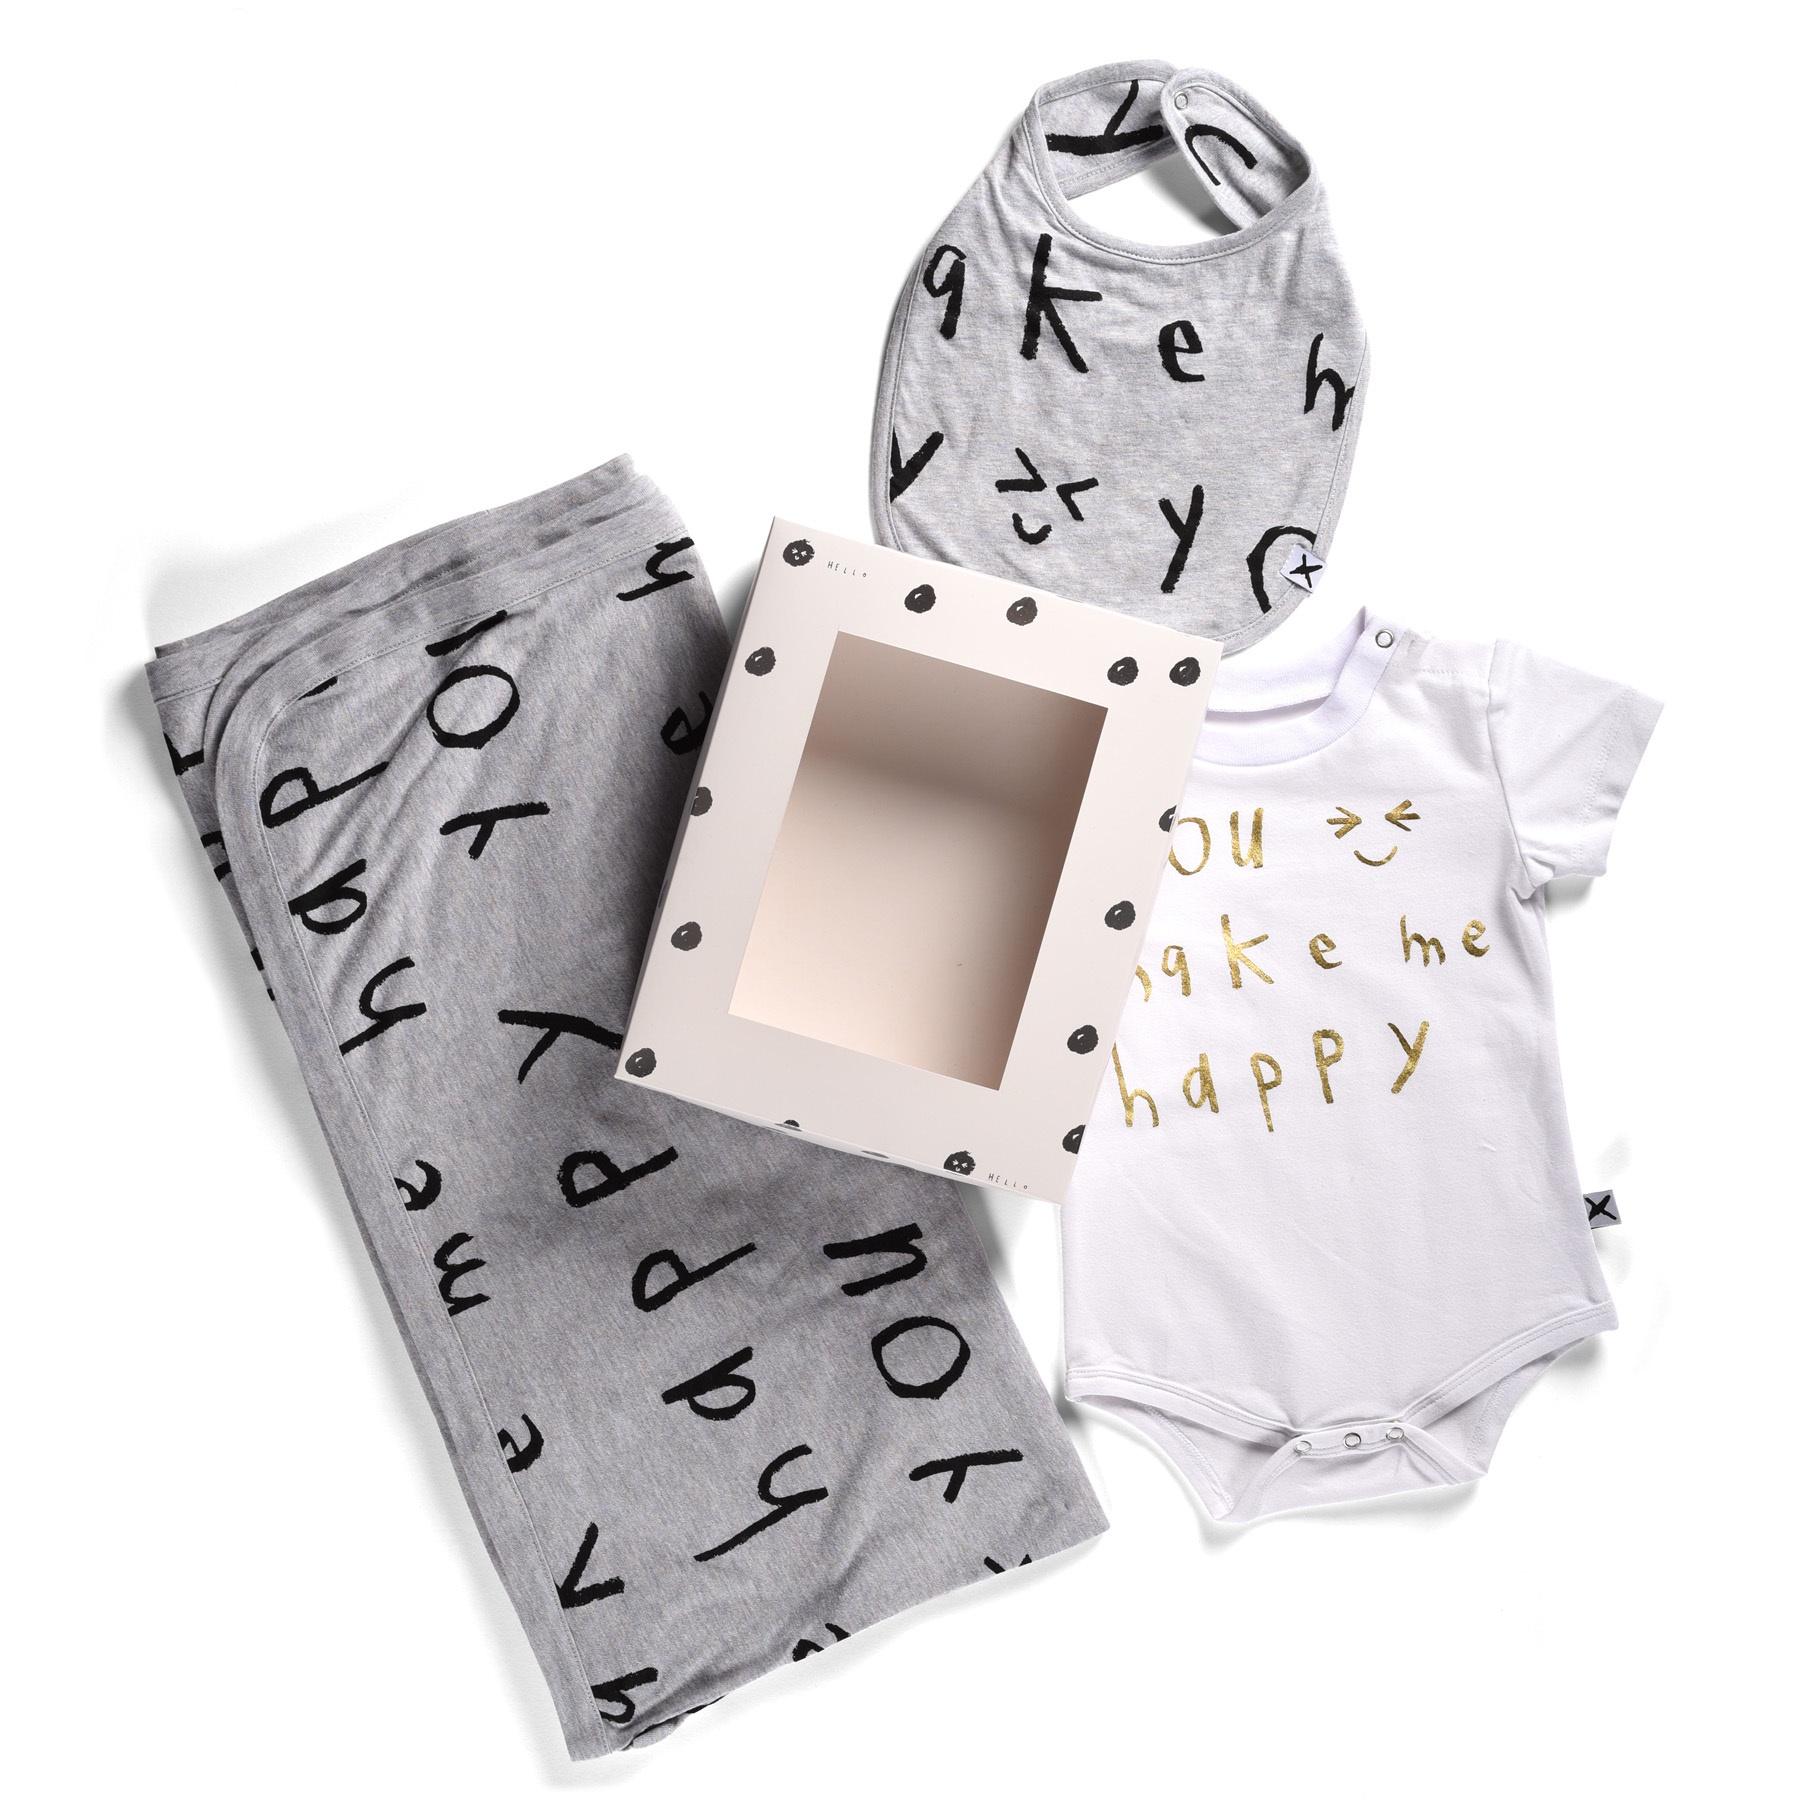 Minti You Make Me Happy Gift Pack